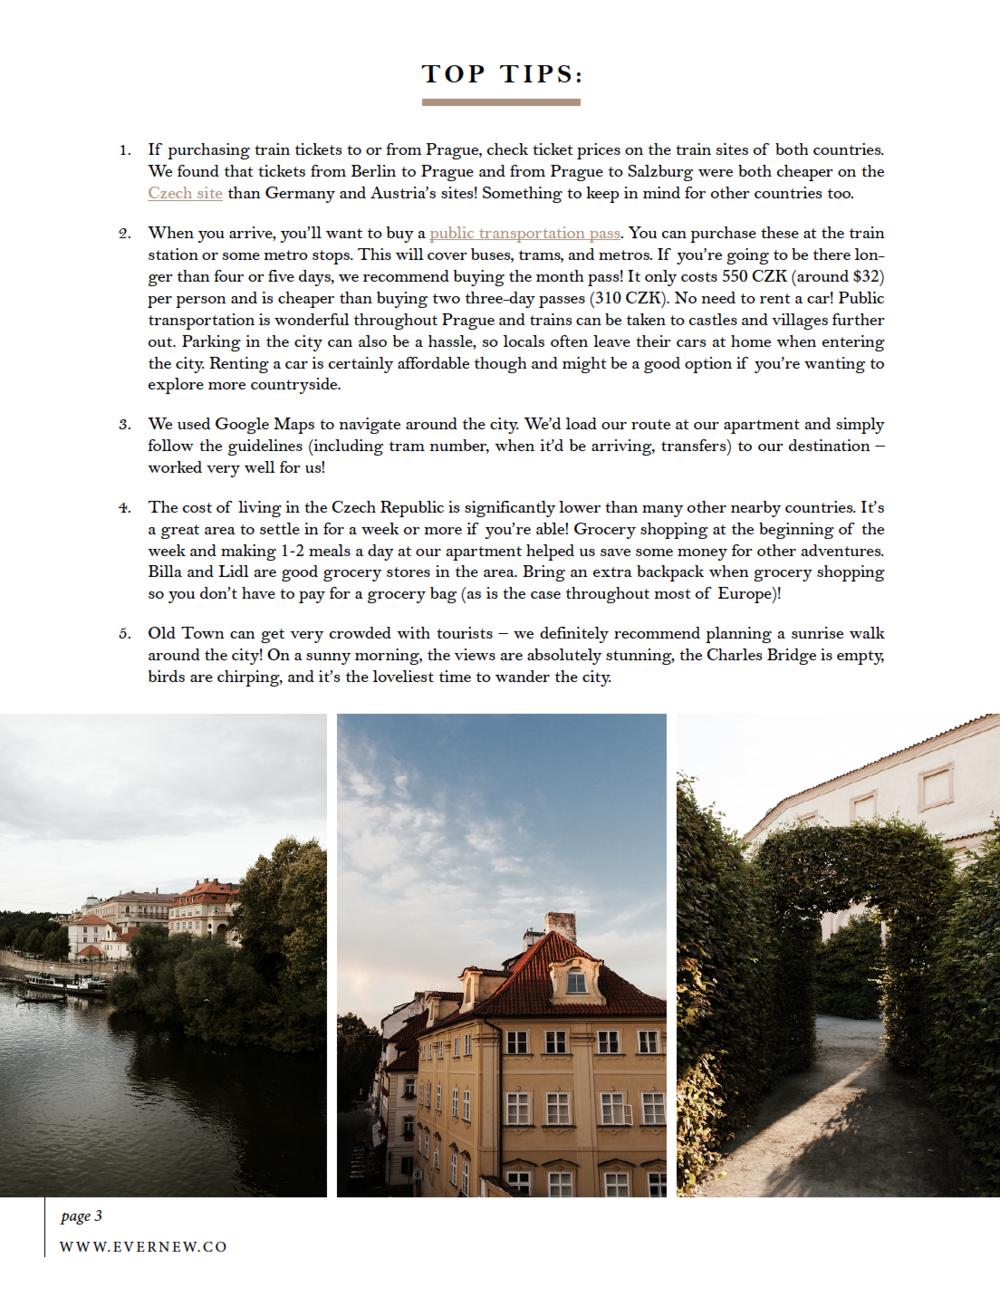 Week Travel Guide in Prague, Czech Republic